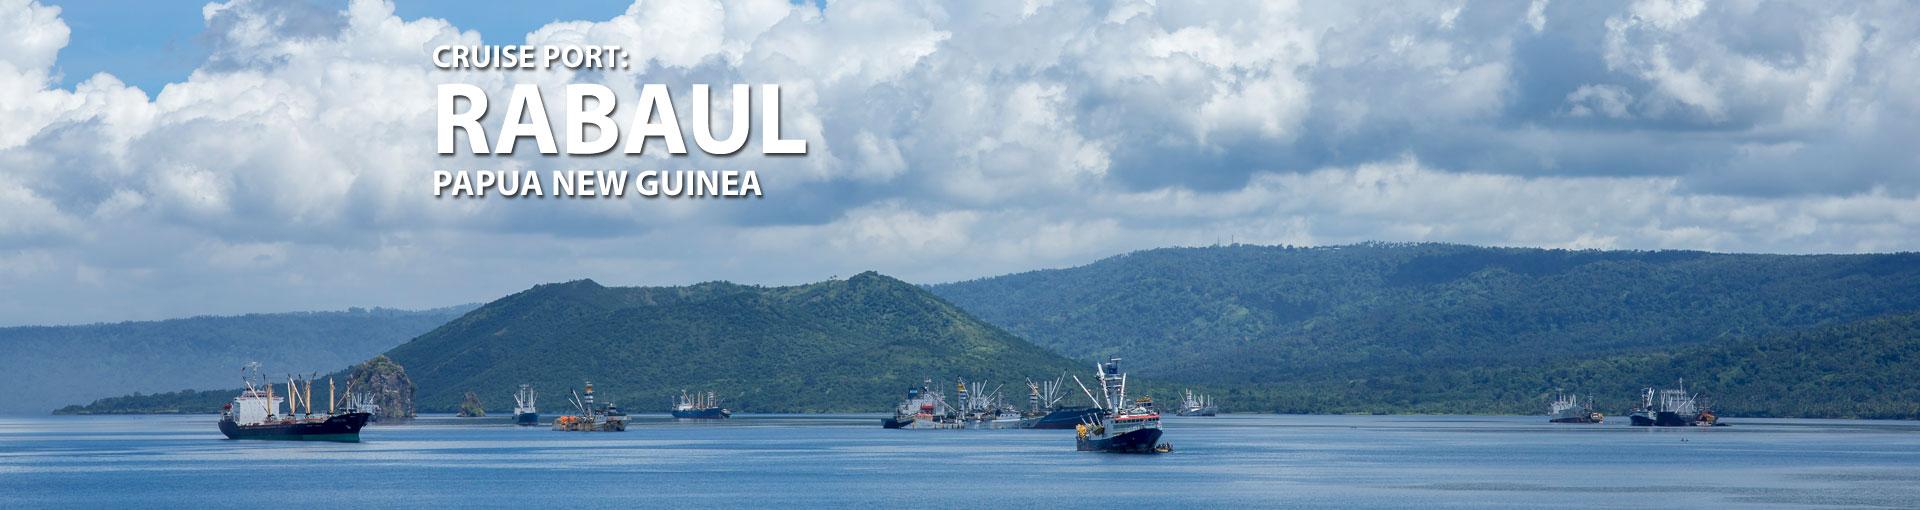 Cruises to Rabaul, Papua New Guinea